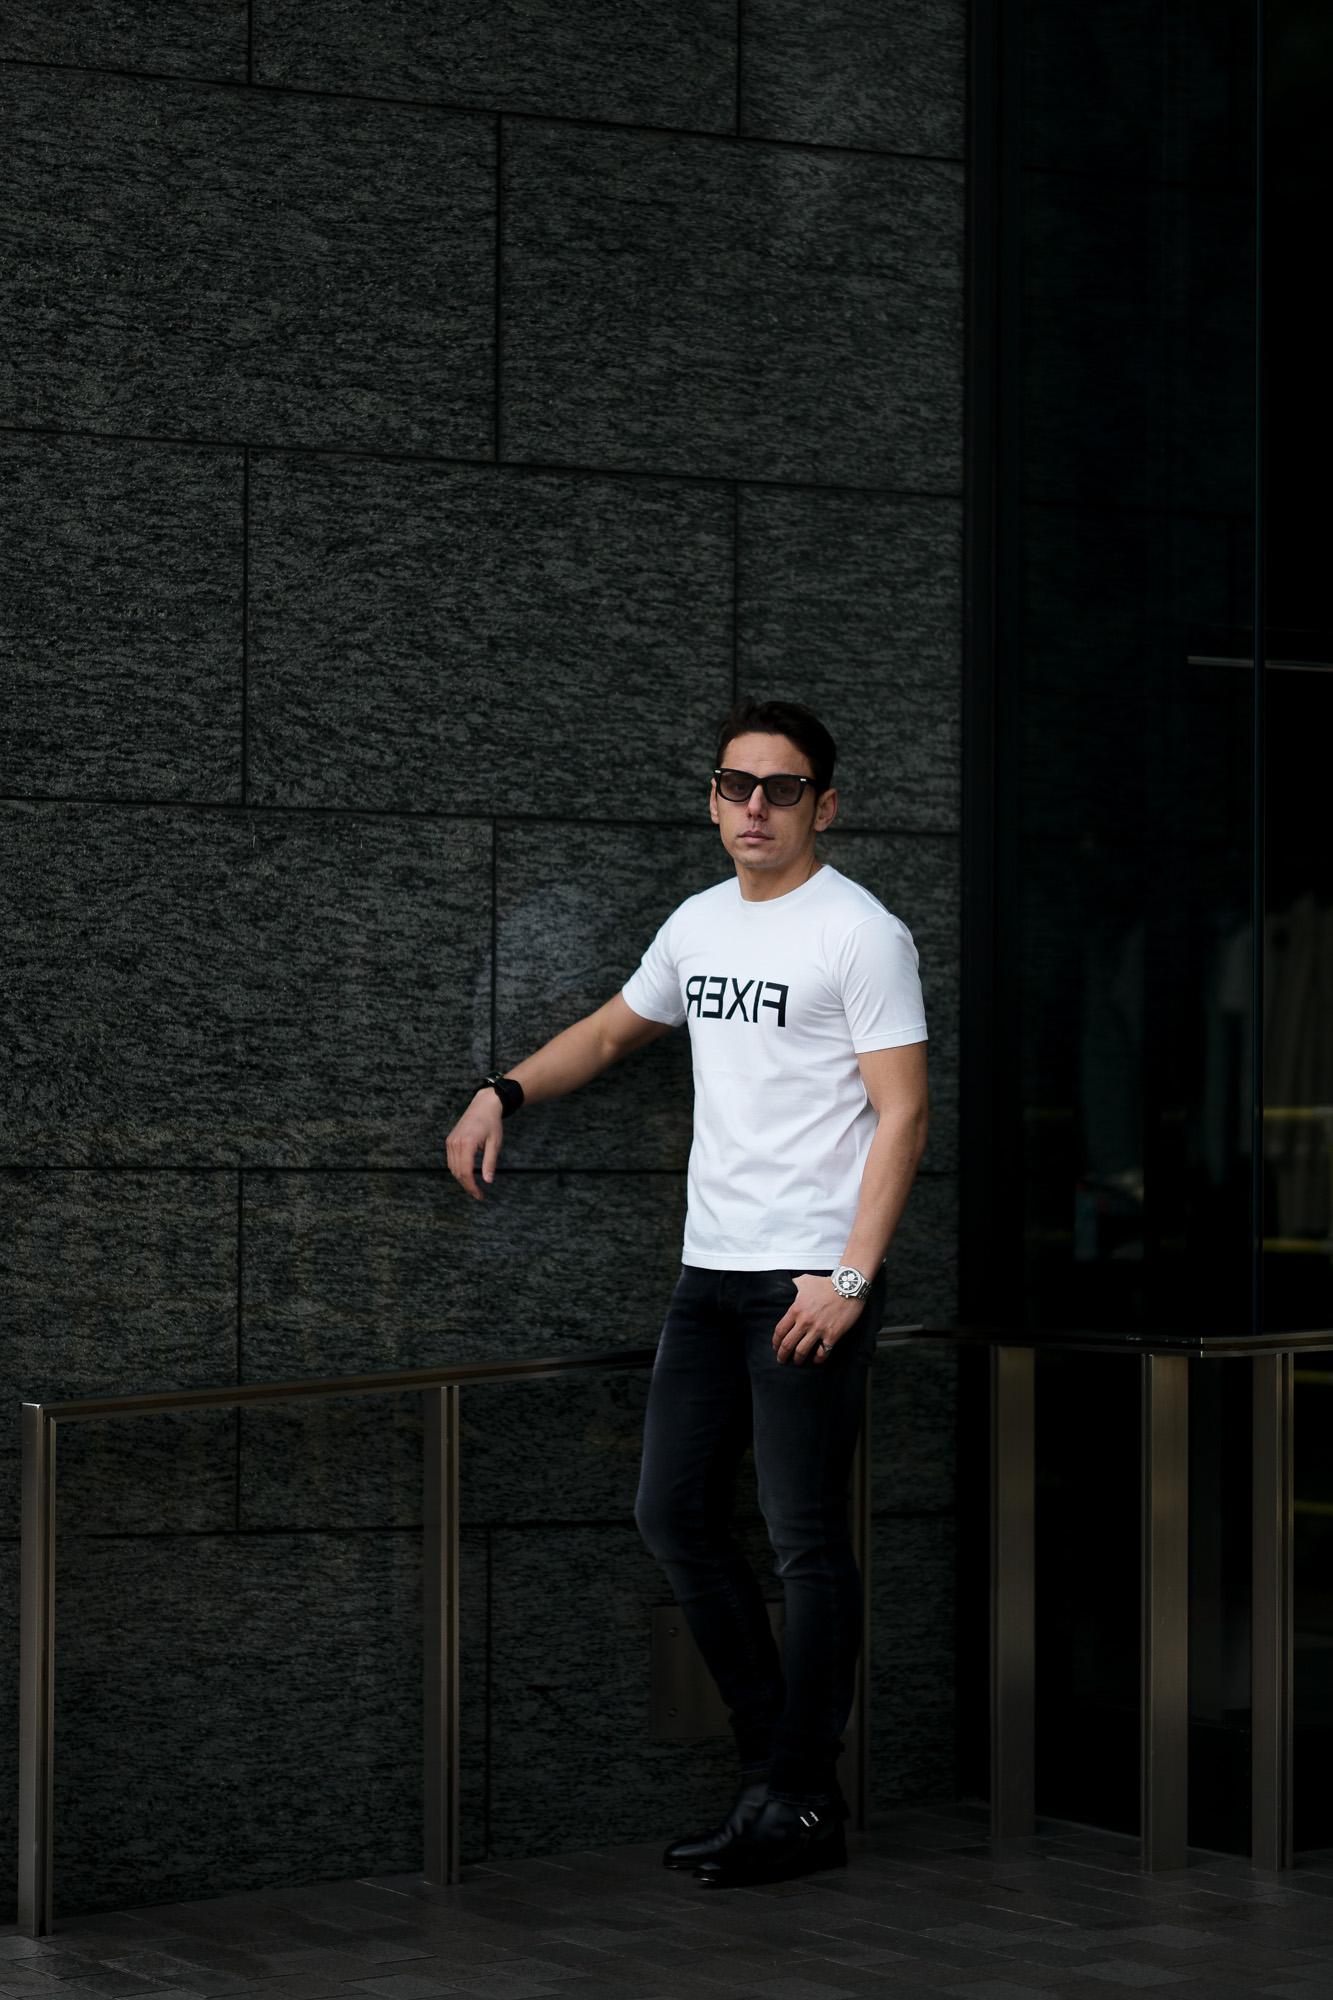 FIXER (フィクサー) FTS-03 Reverse Print Crew Neck T-shirt リバースプリント Tシャツ WHITE (ホワイト) 【ご予約開始】【2021.4.17(Sat)~2021.5.03(Mon)】 愛知 名古屋 Alto e Diritto altoediritto アルトエデリット Tシャツ